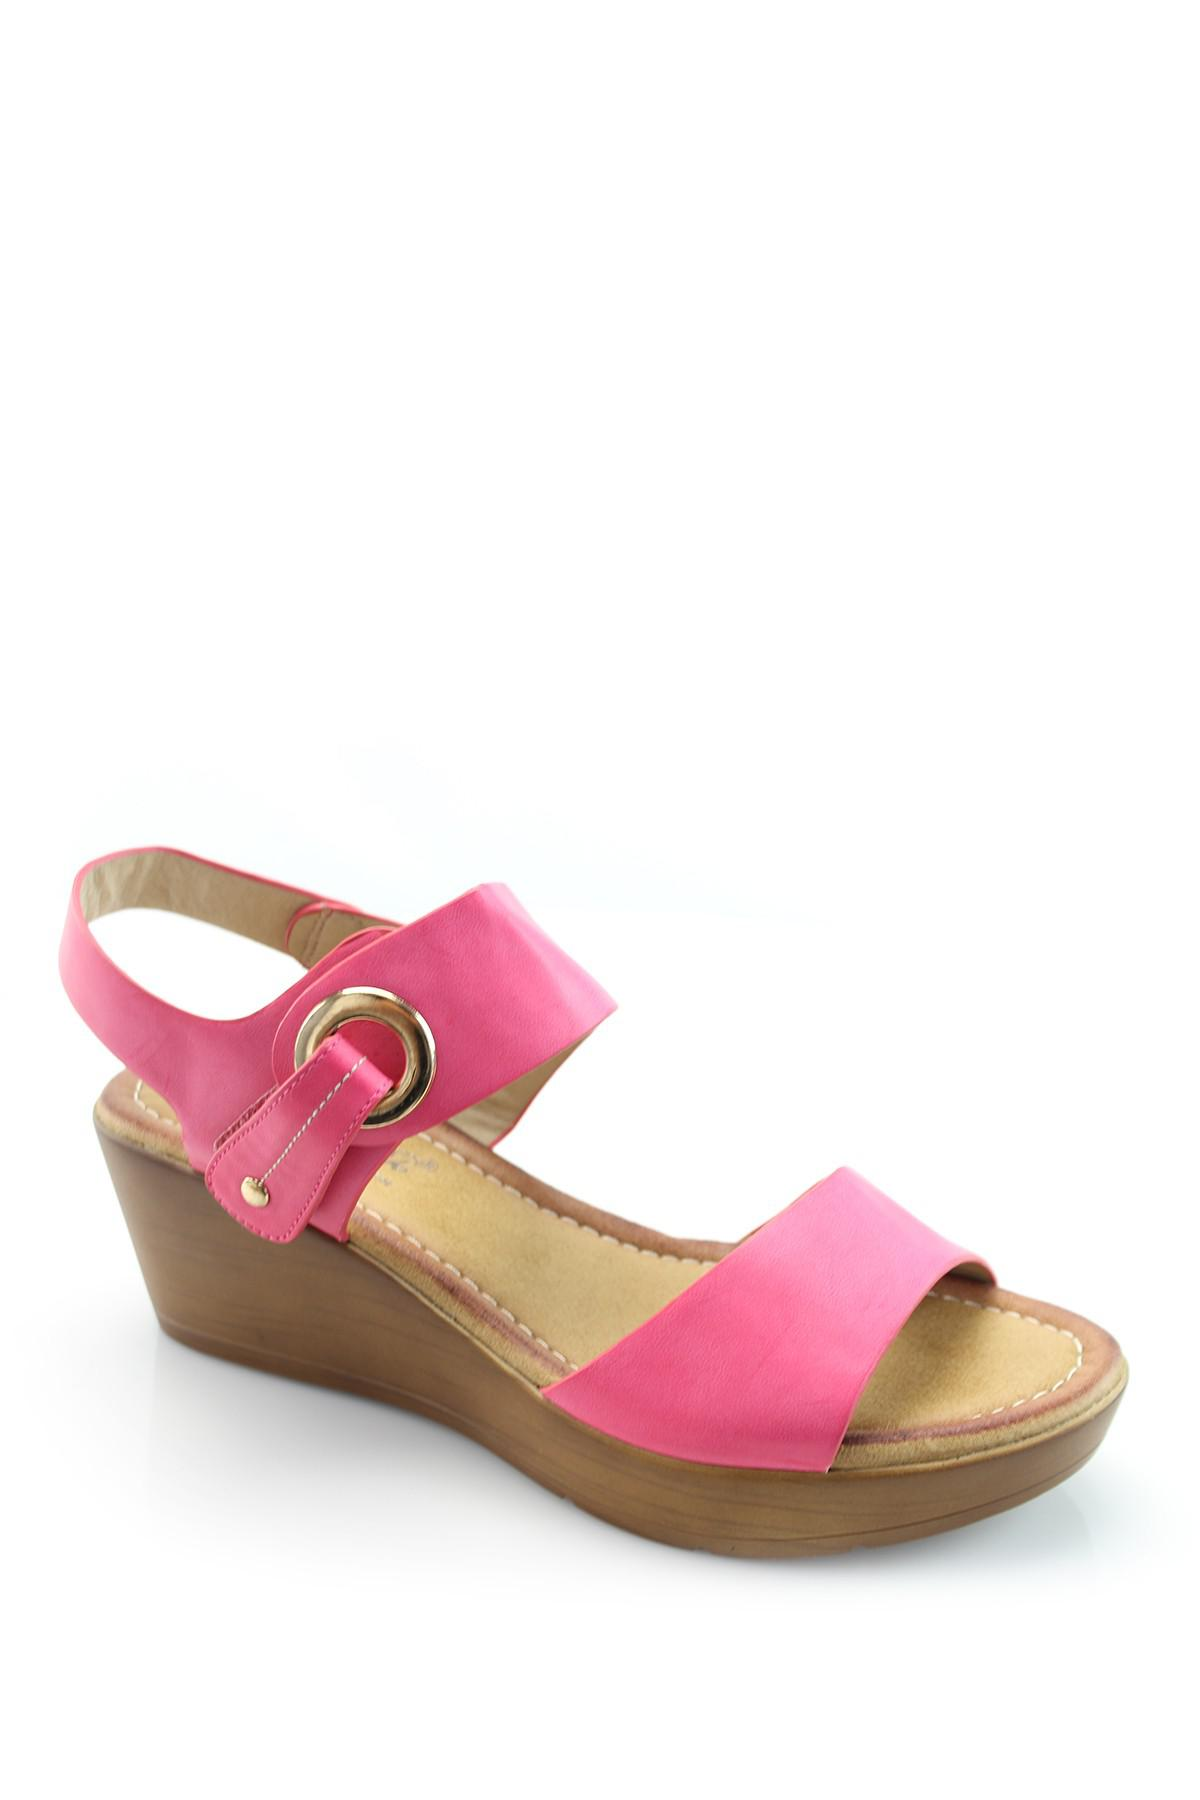 Elegant Footwear Hasina Wedge Sandal 5JRZyI4Jd3